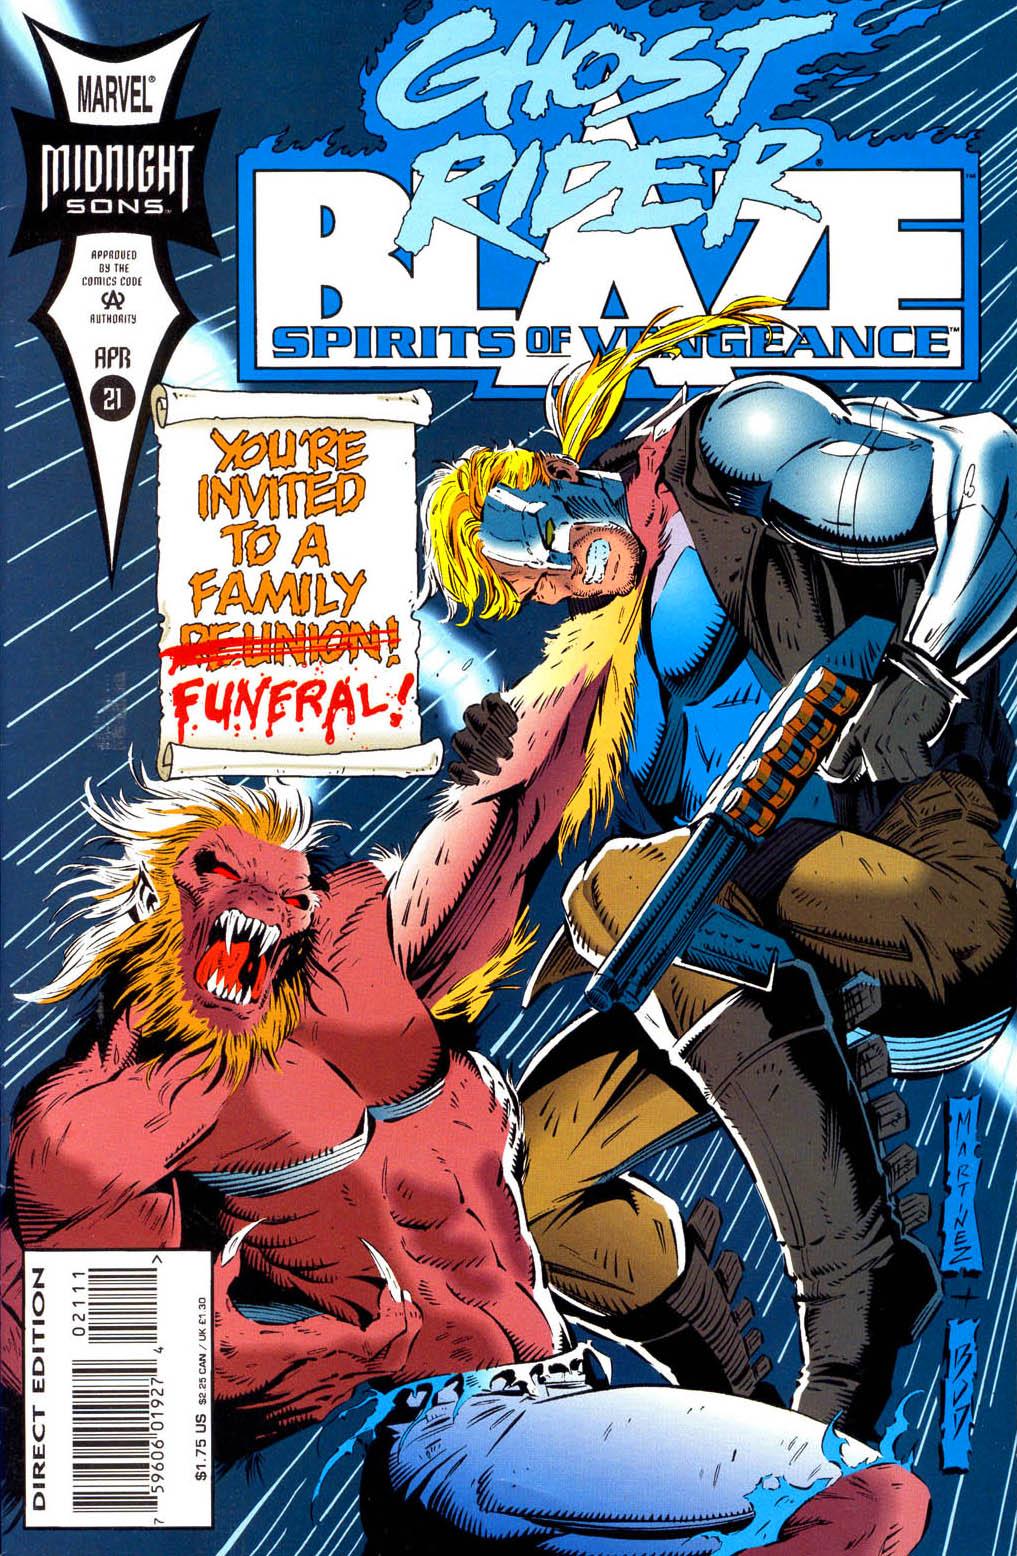 Ghost Rider/Blaze: Spirits of Vengeance 21 Page 1